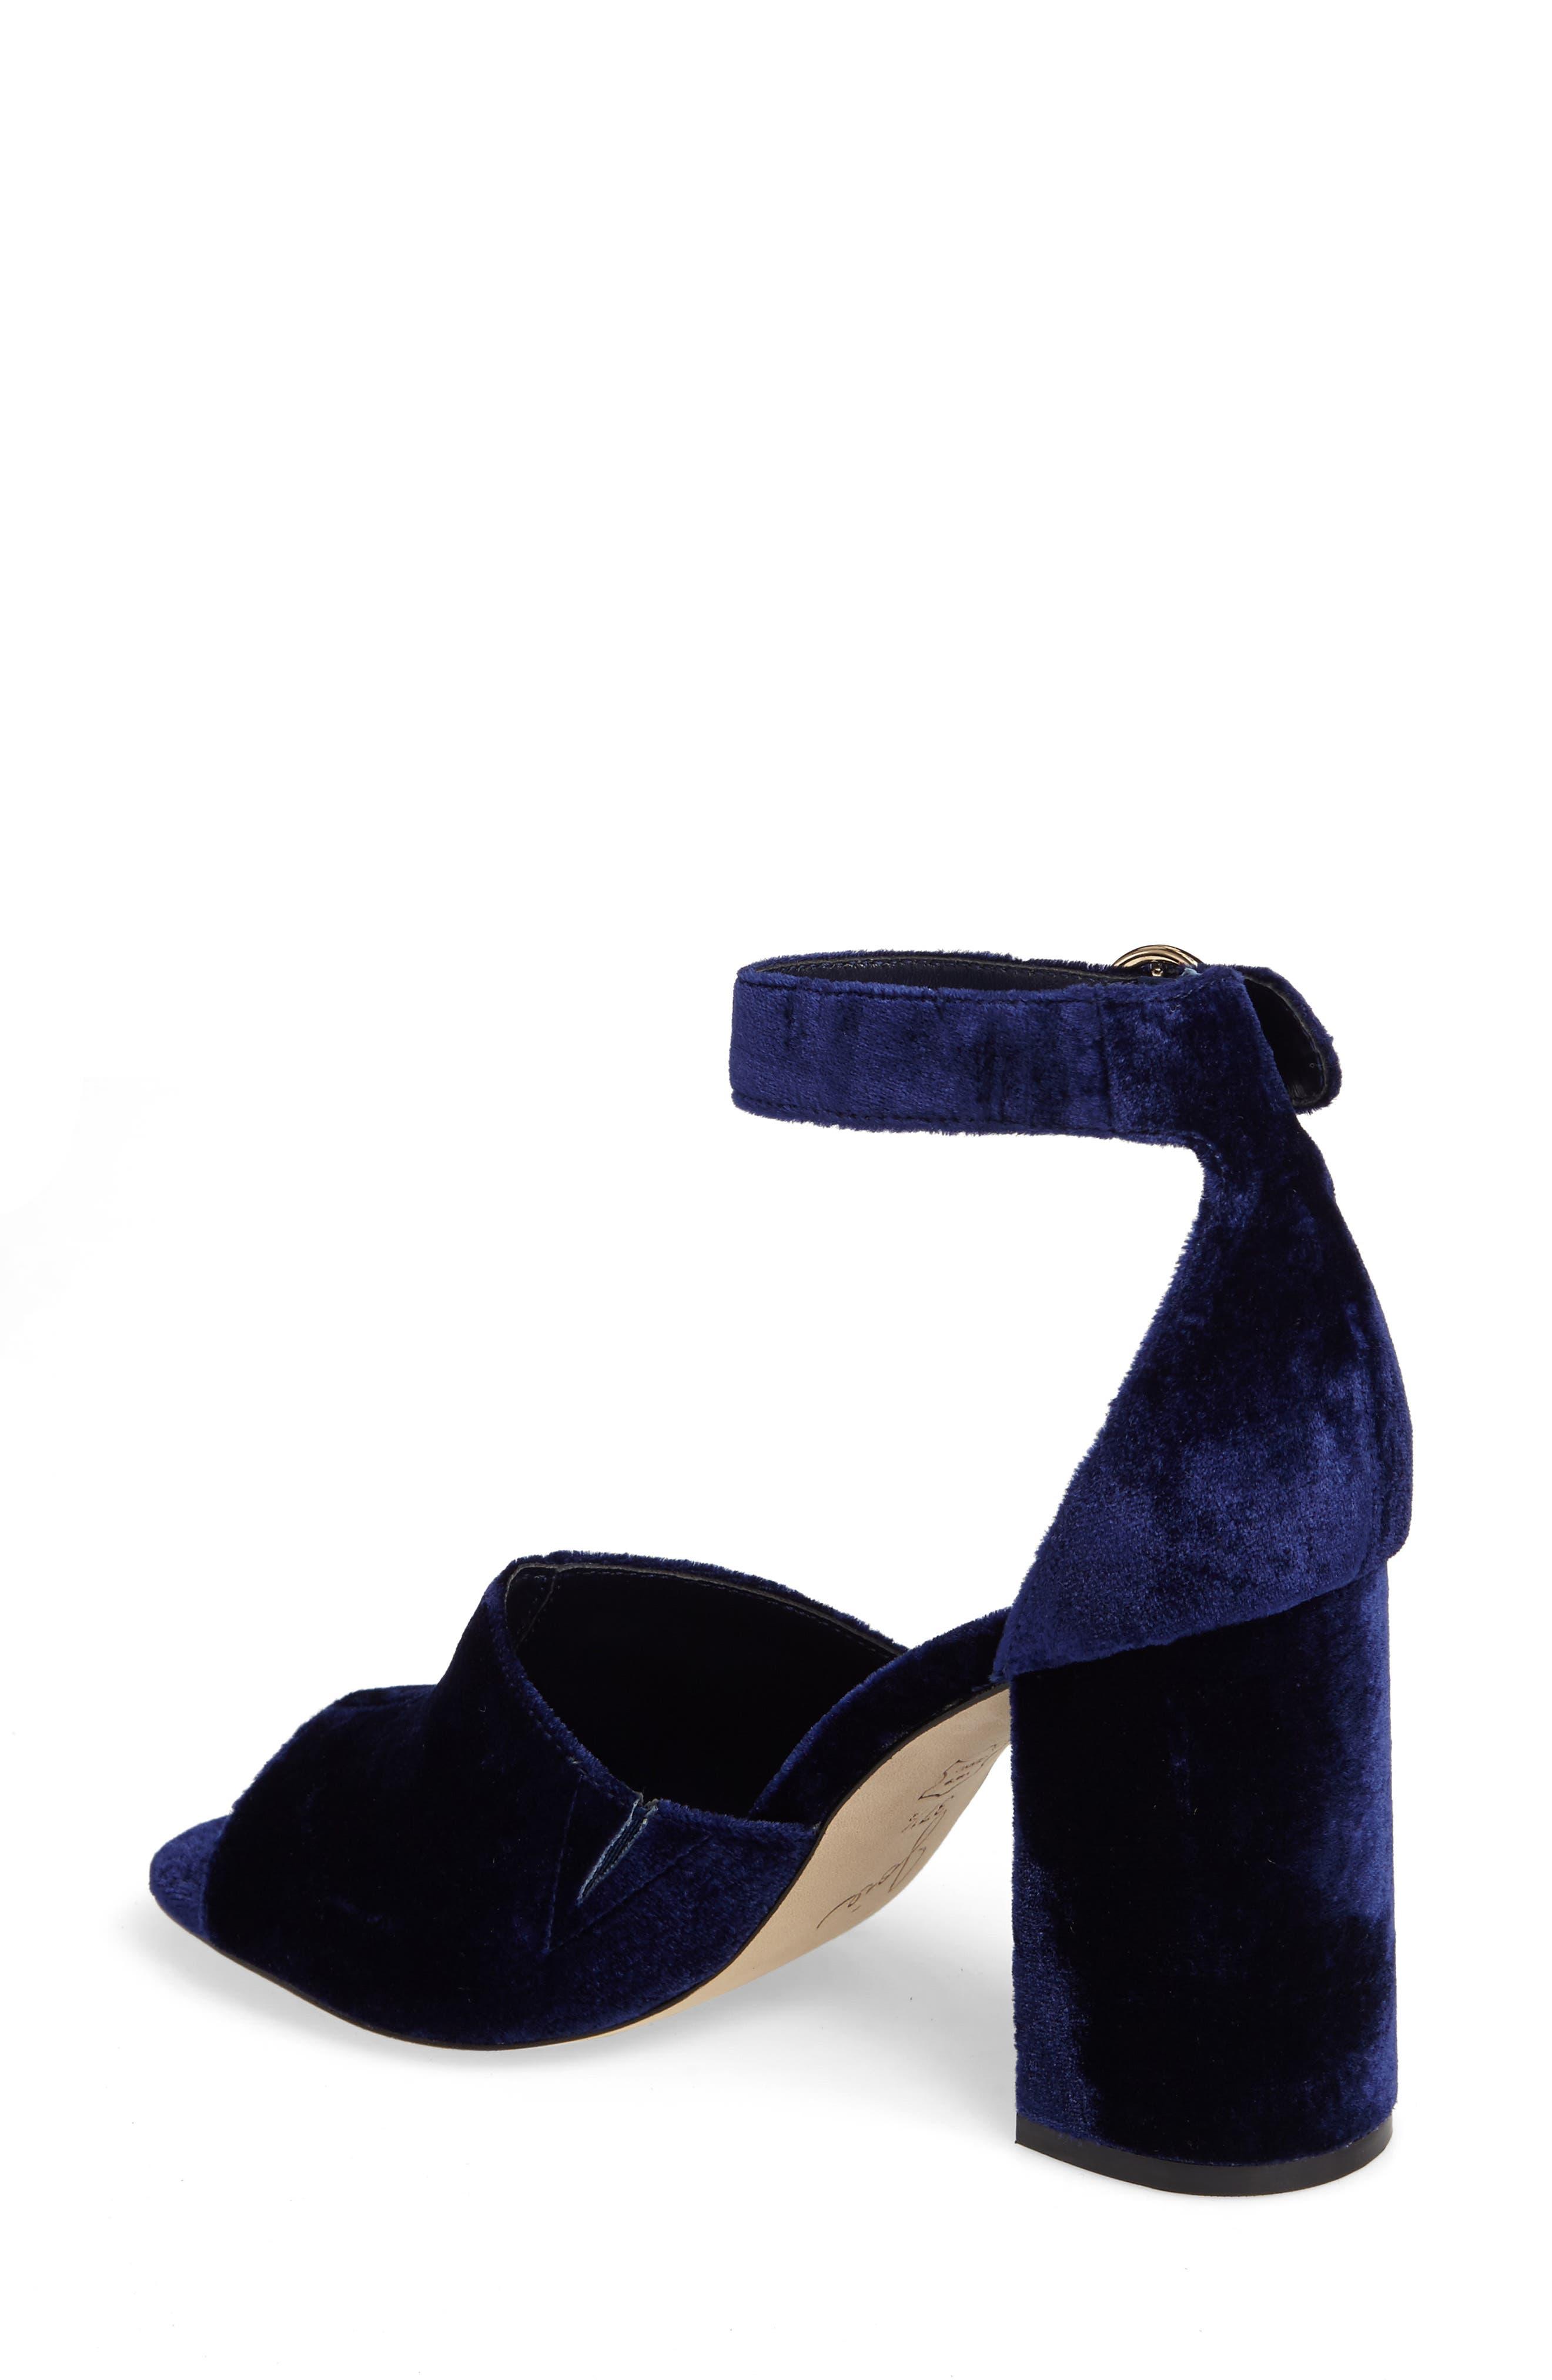 Lahoma Block Heel Sandal,                             Alternate thumbnail 2, color,                             411